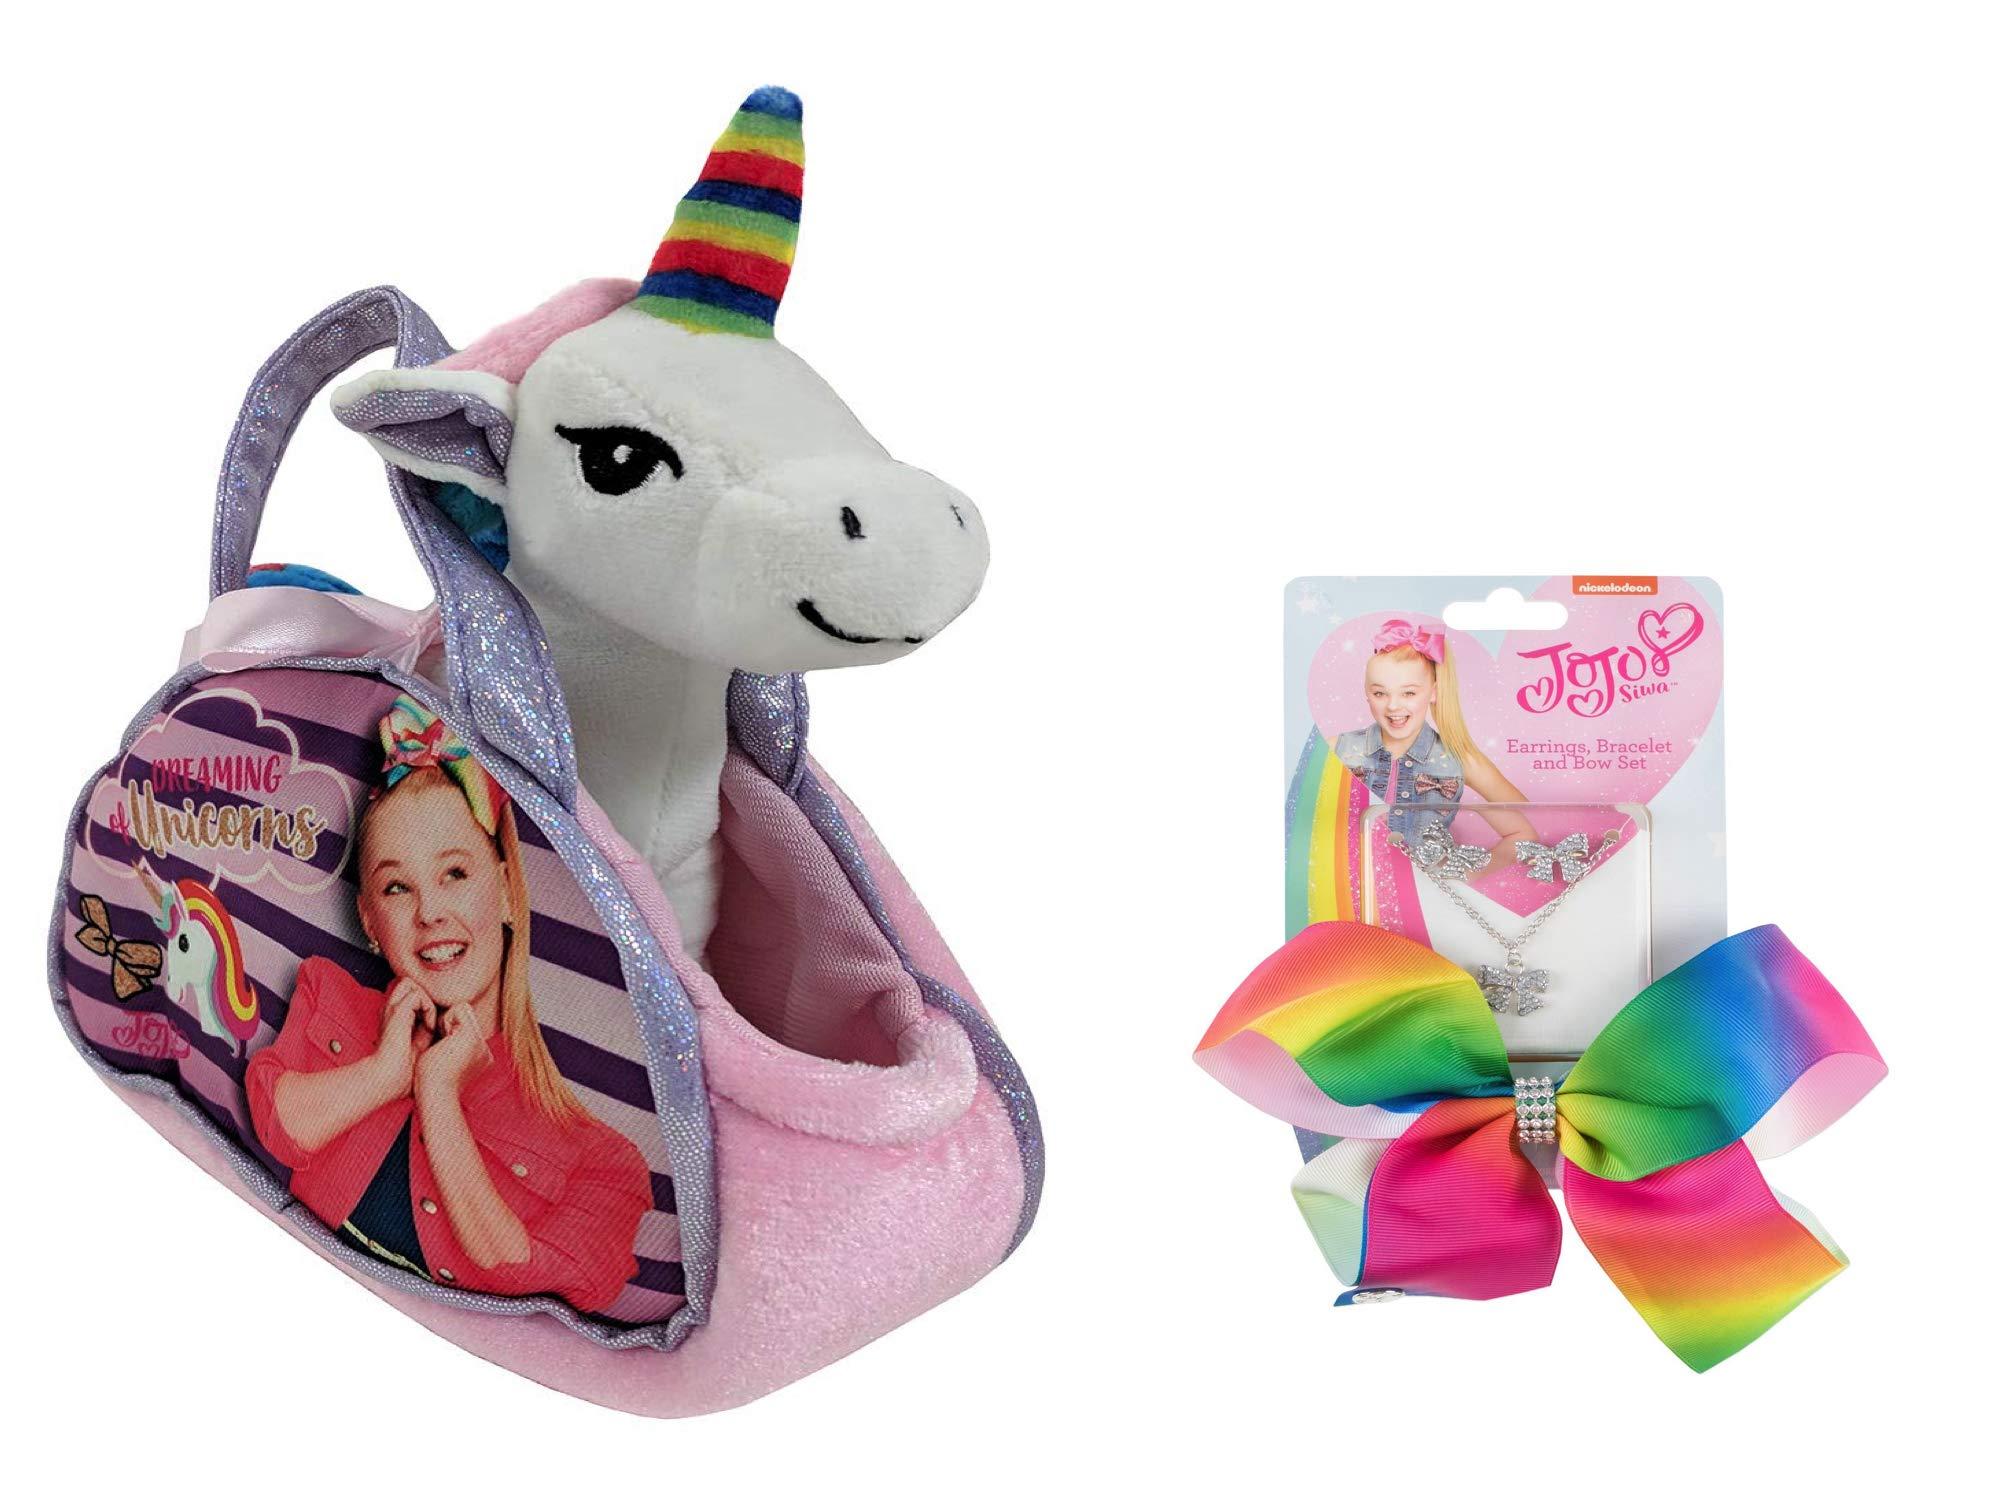 Nickelodeon JoJo Siwa Dreaming of Unicorns Purse W/Removable Plush Unicorn & JoJo Rainbow Hair Bow - Multi Value Bundle